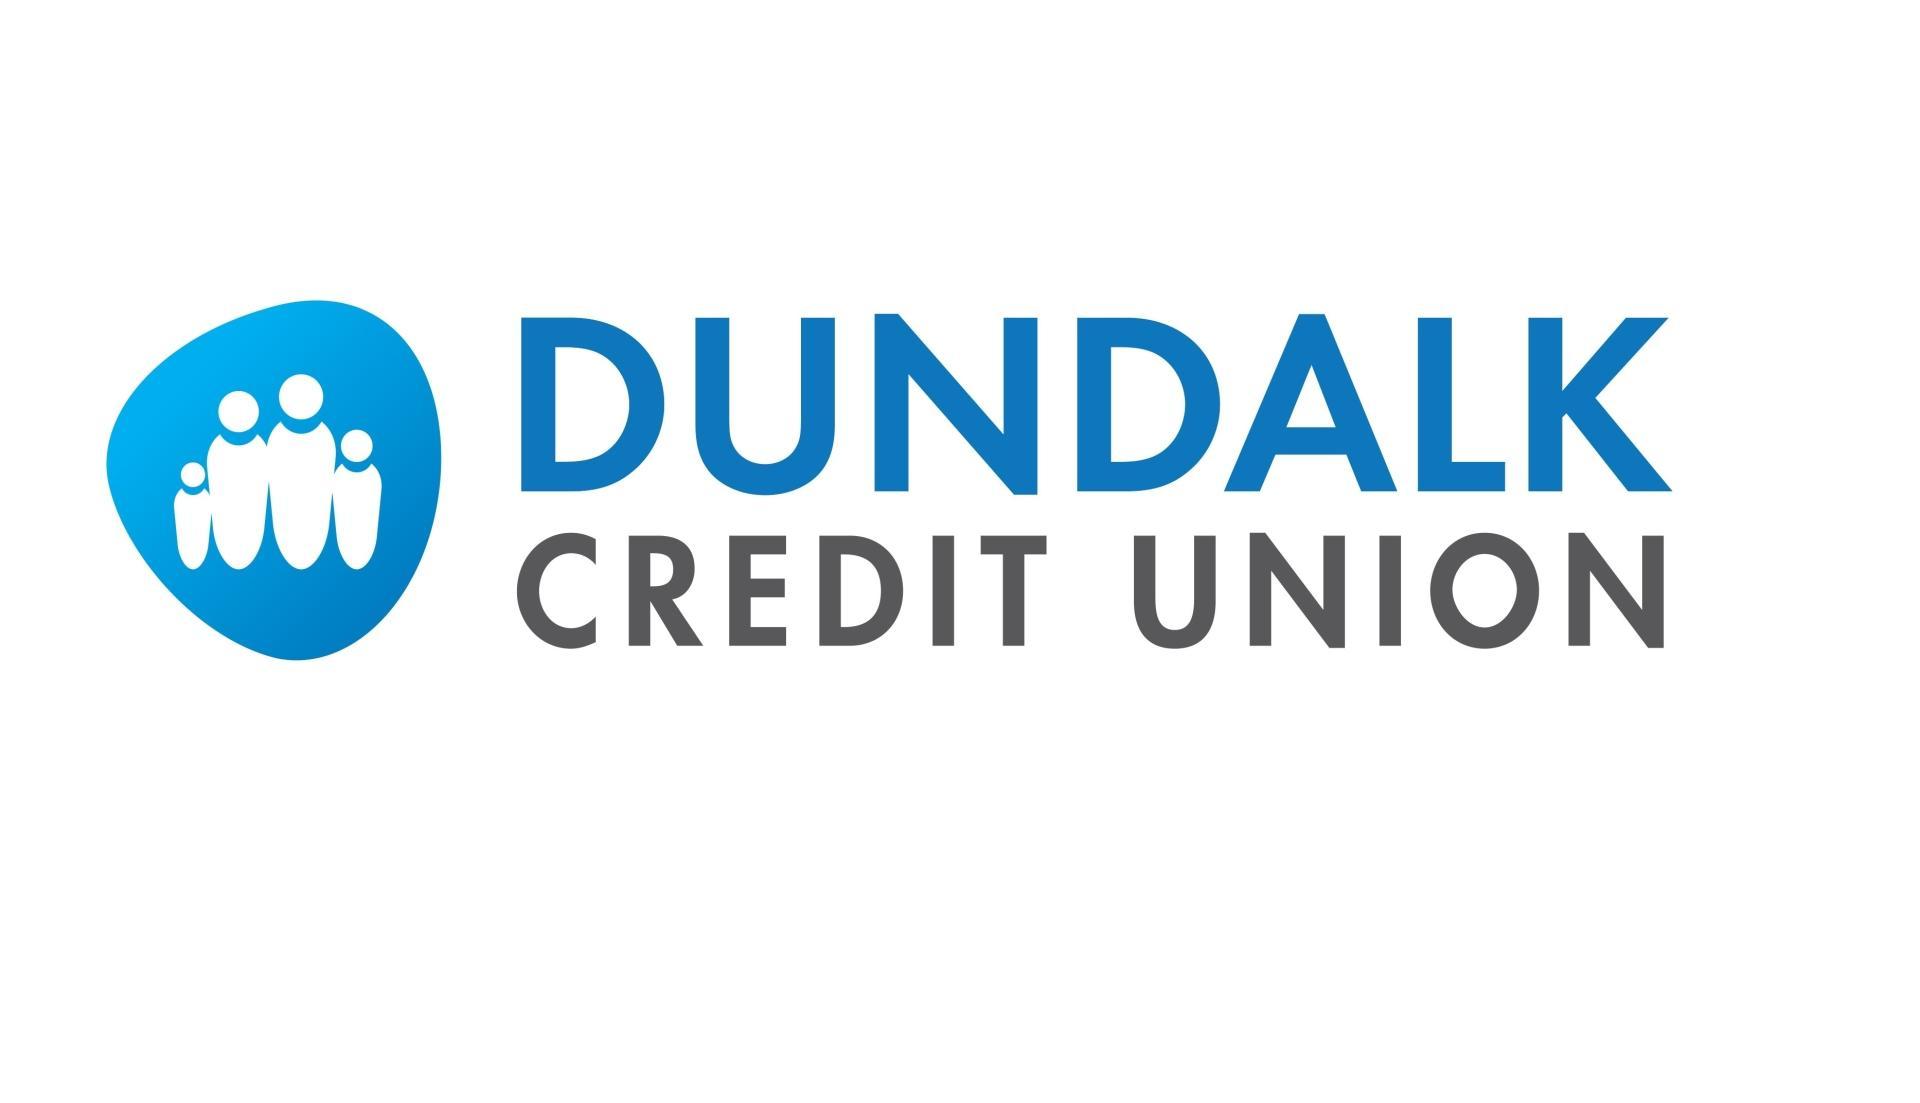 Dundalk Credit Union